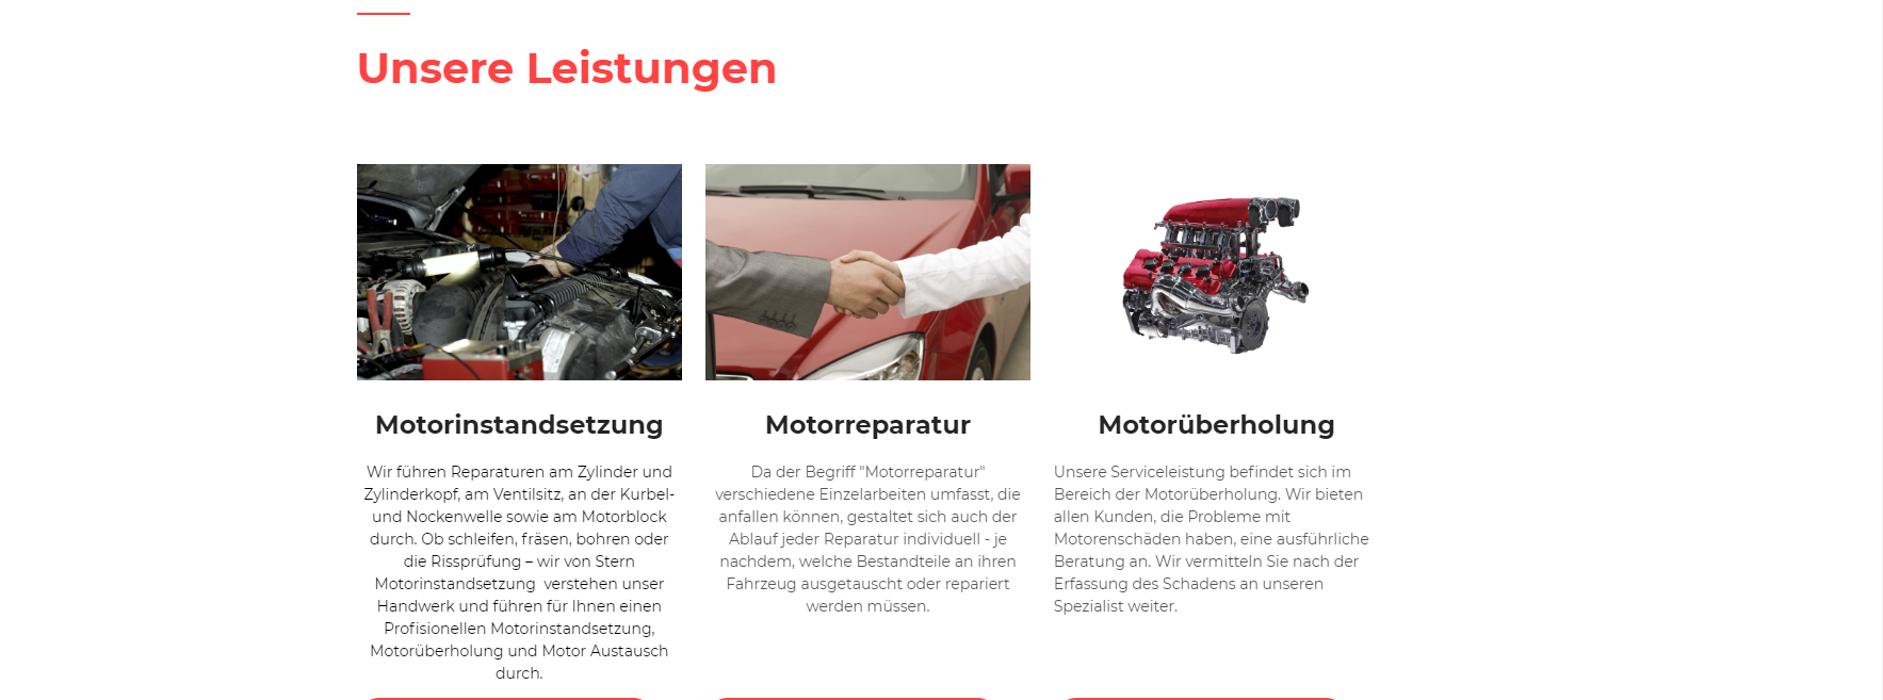 abclocal - discover about Stern Motorinstandsetzung in Bad Salzuflen